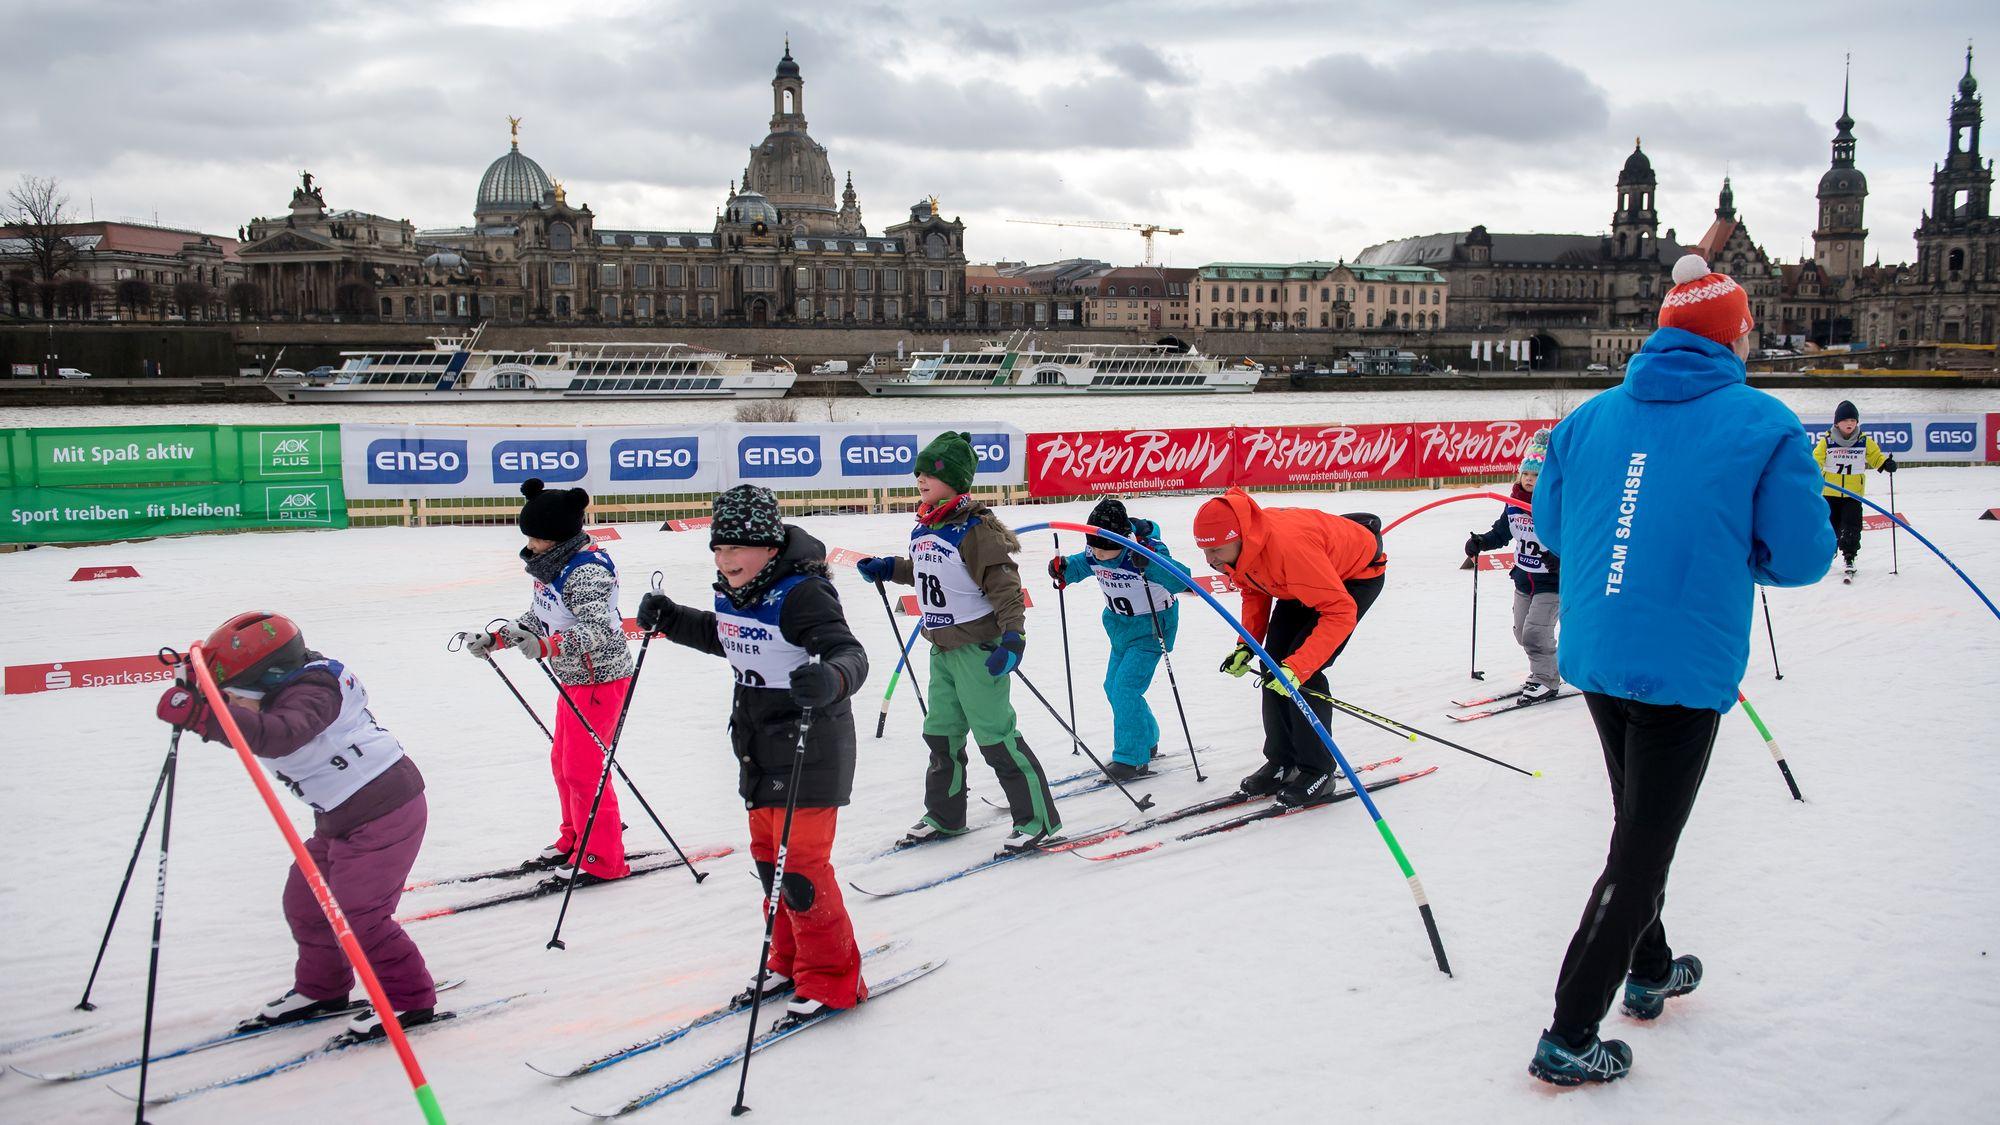 Ski-Schülerwoche am Elbufer - Foto: PR/Thomas Eisenhuth